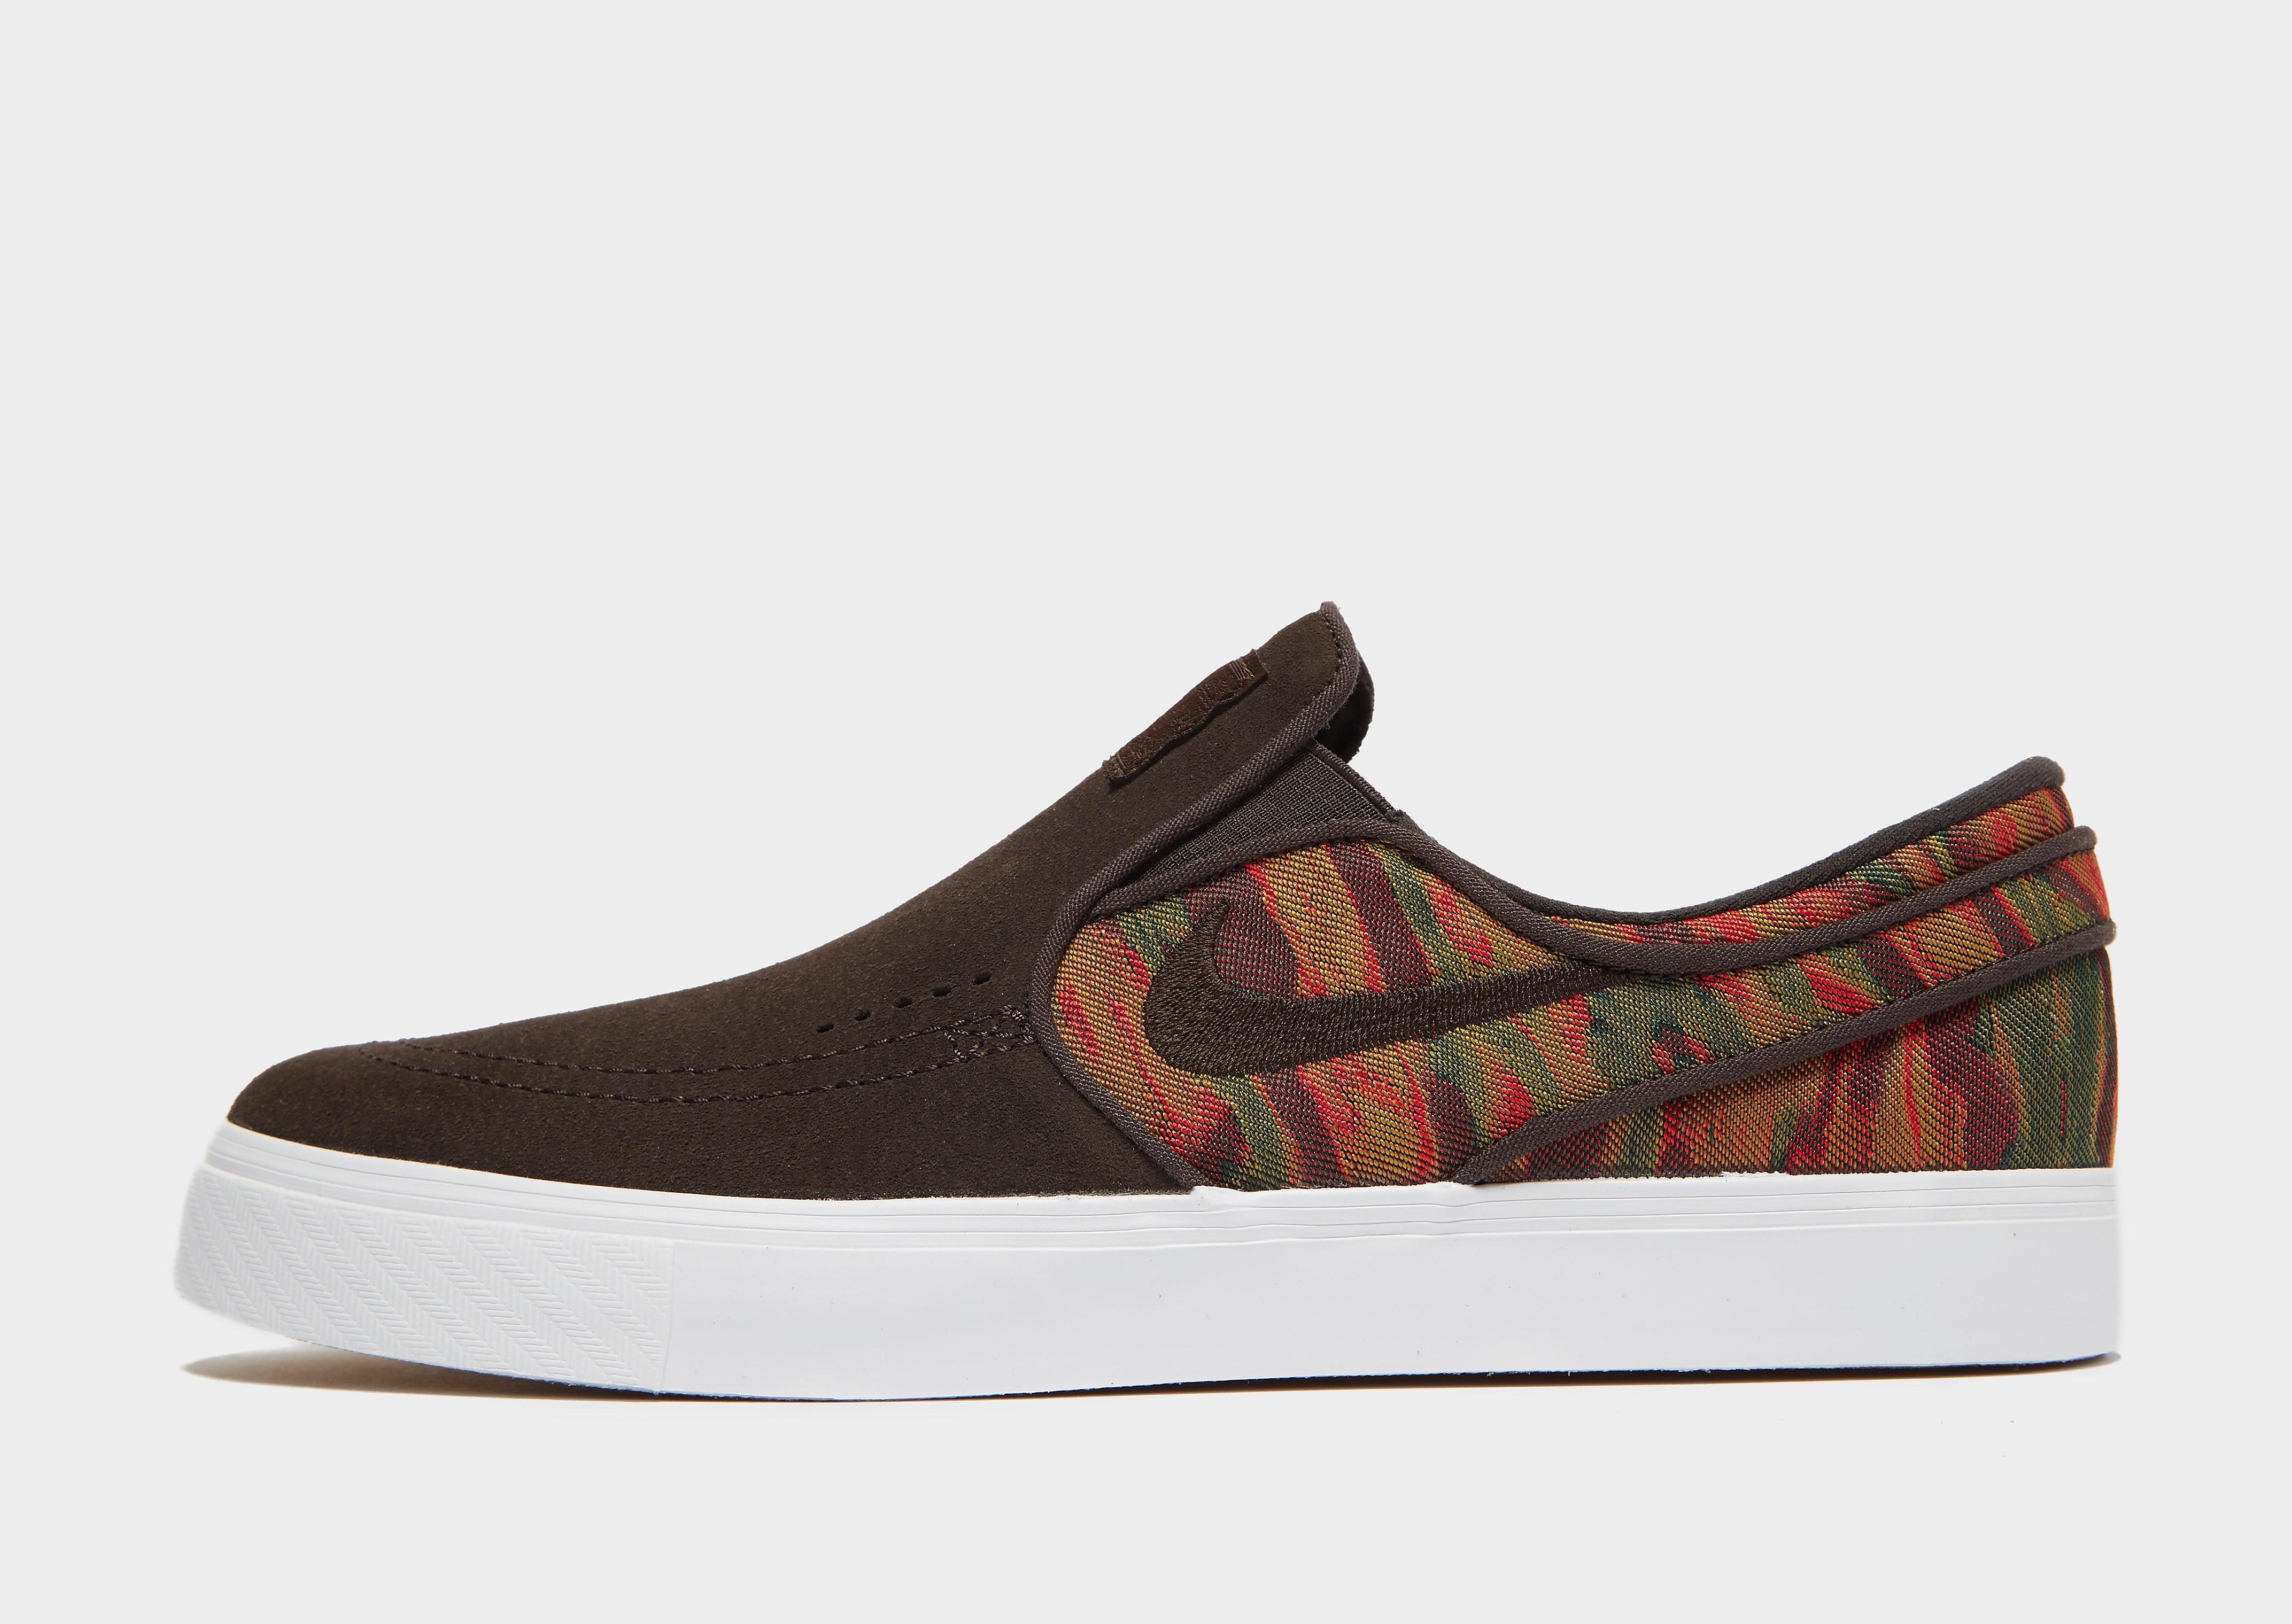 Nike Stefan Janoski herensneaker bruin